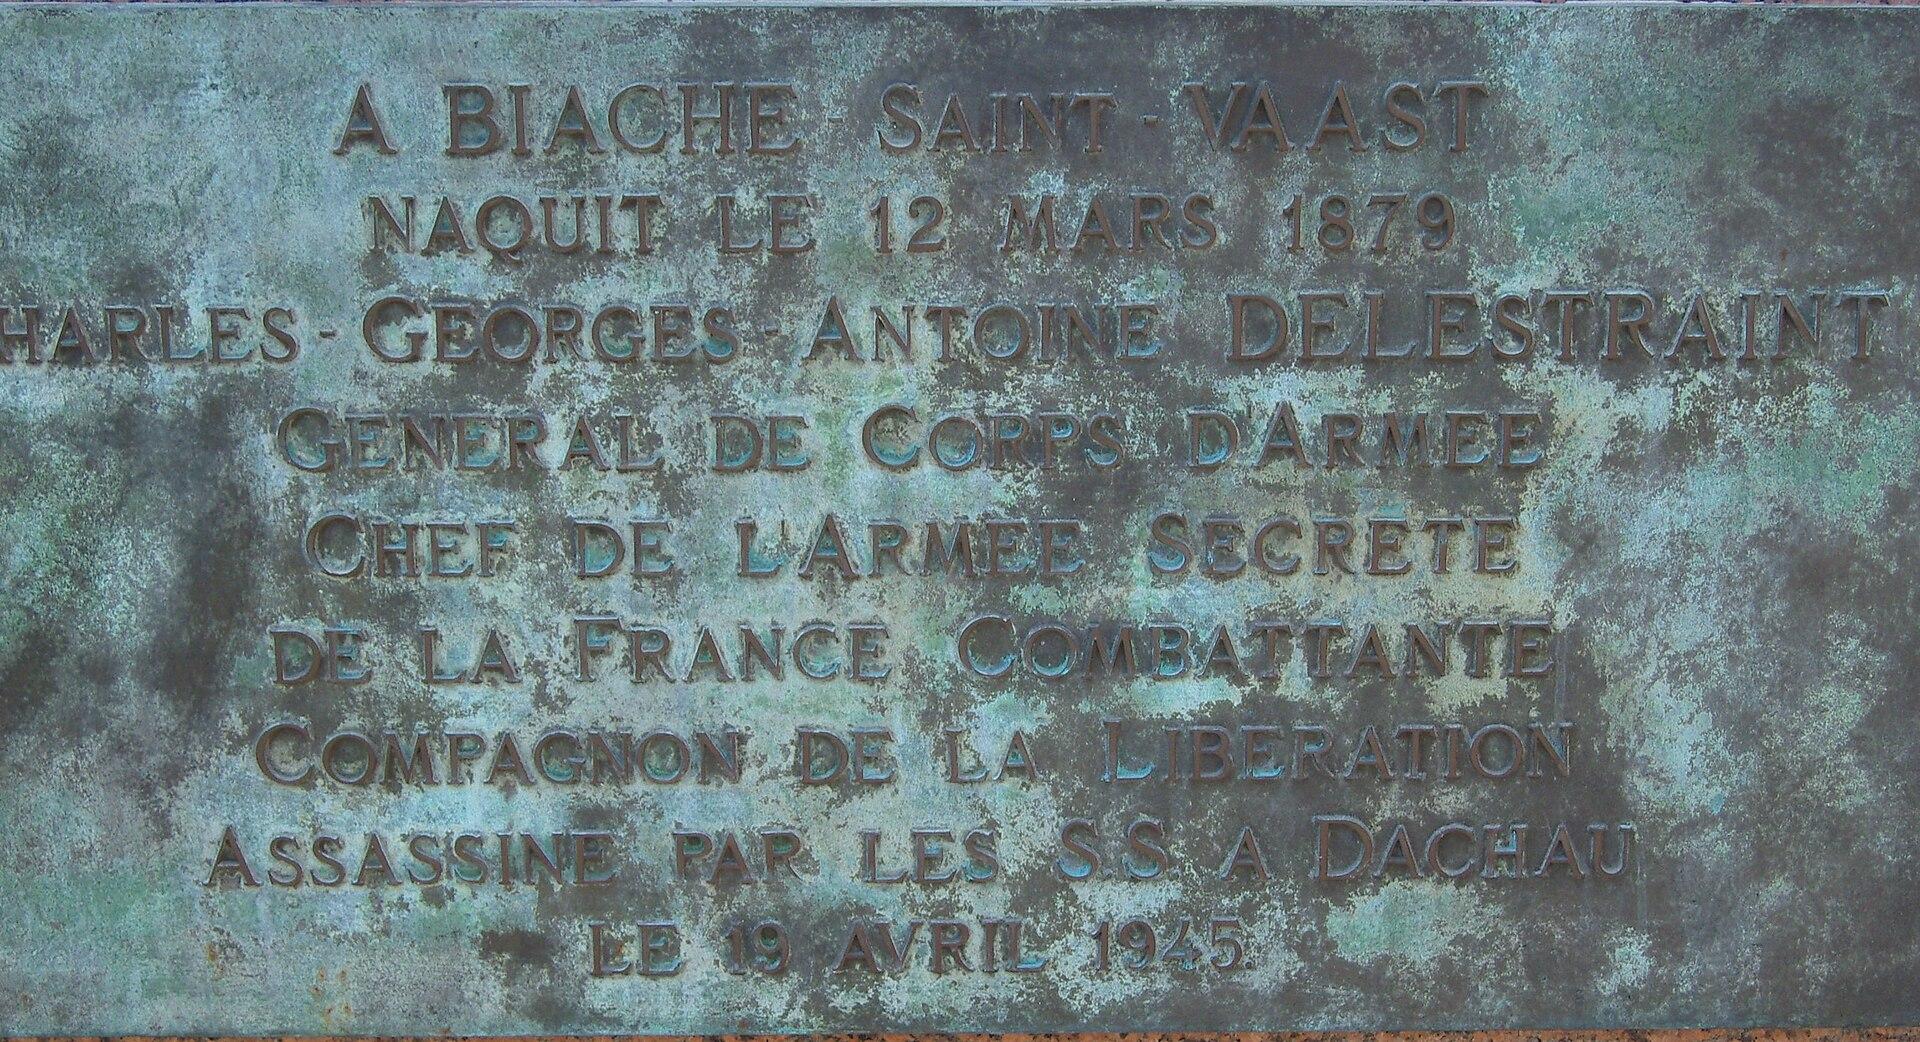 Rencontre biarritz